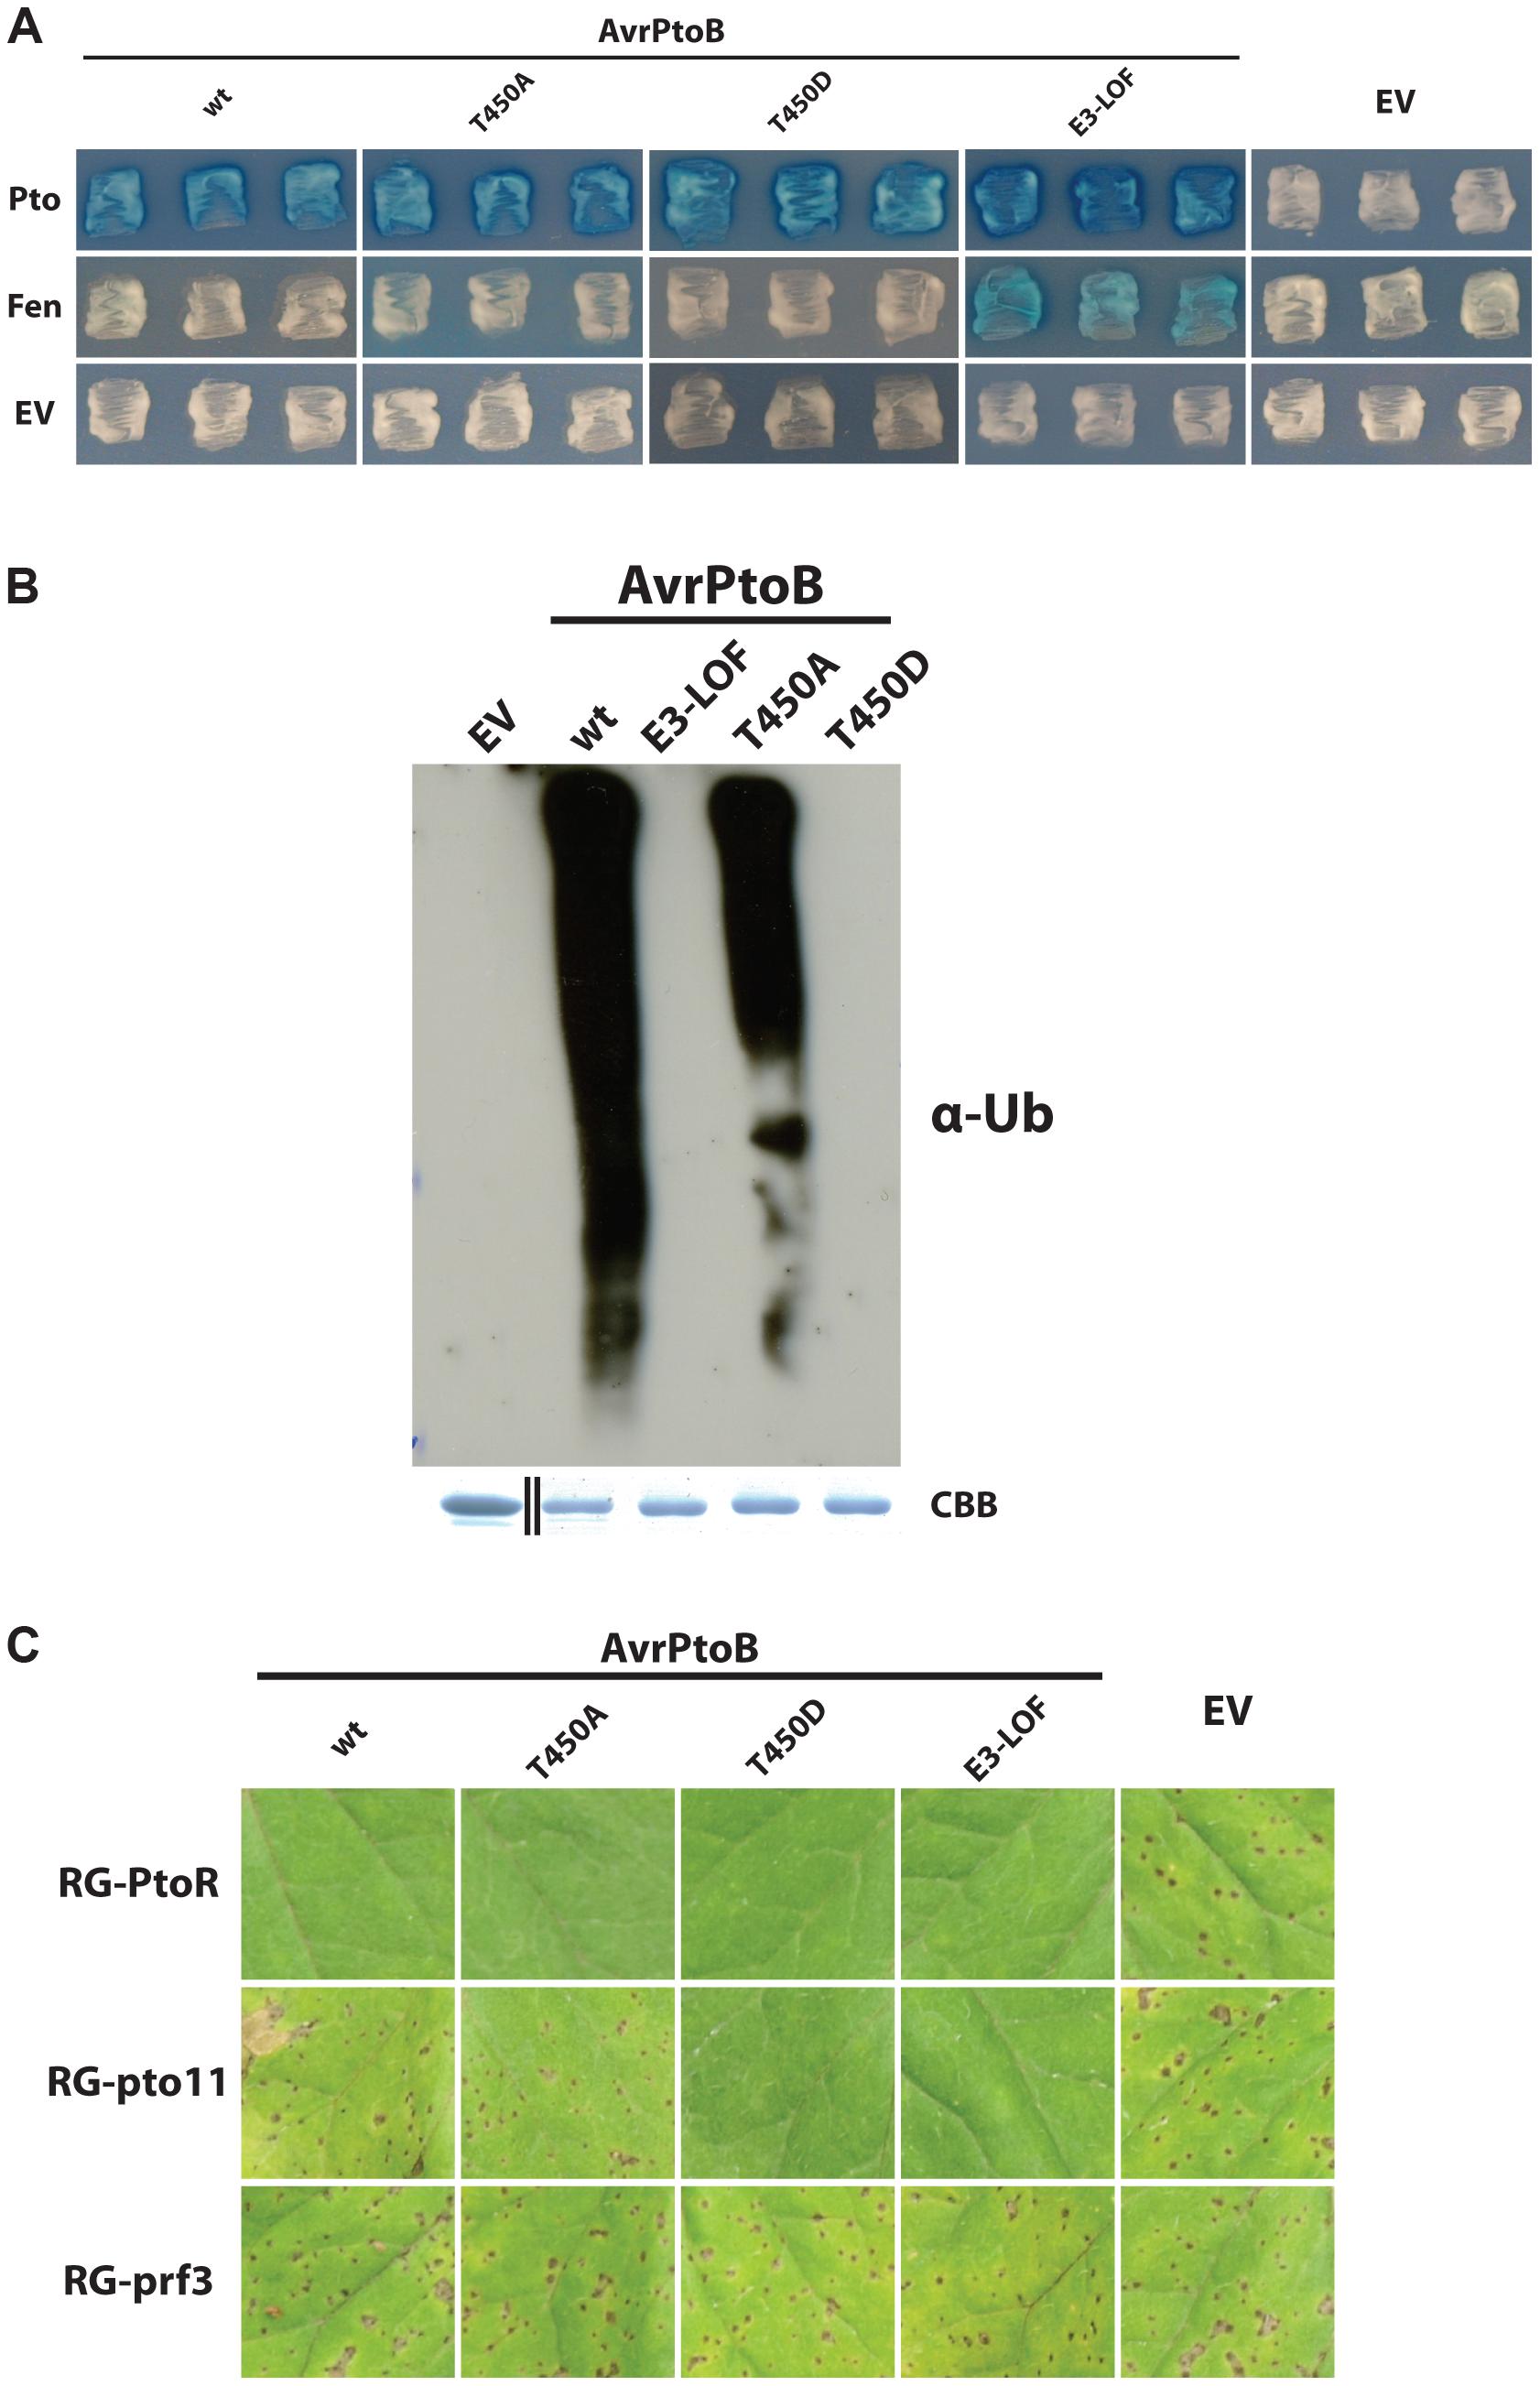 Pto-mediated phosphorylation of T450 in AvrPtoB does not impact Pto recalcitrance to E3 ligase-mediated degradation.